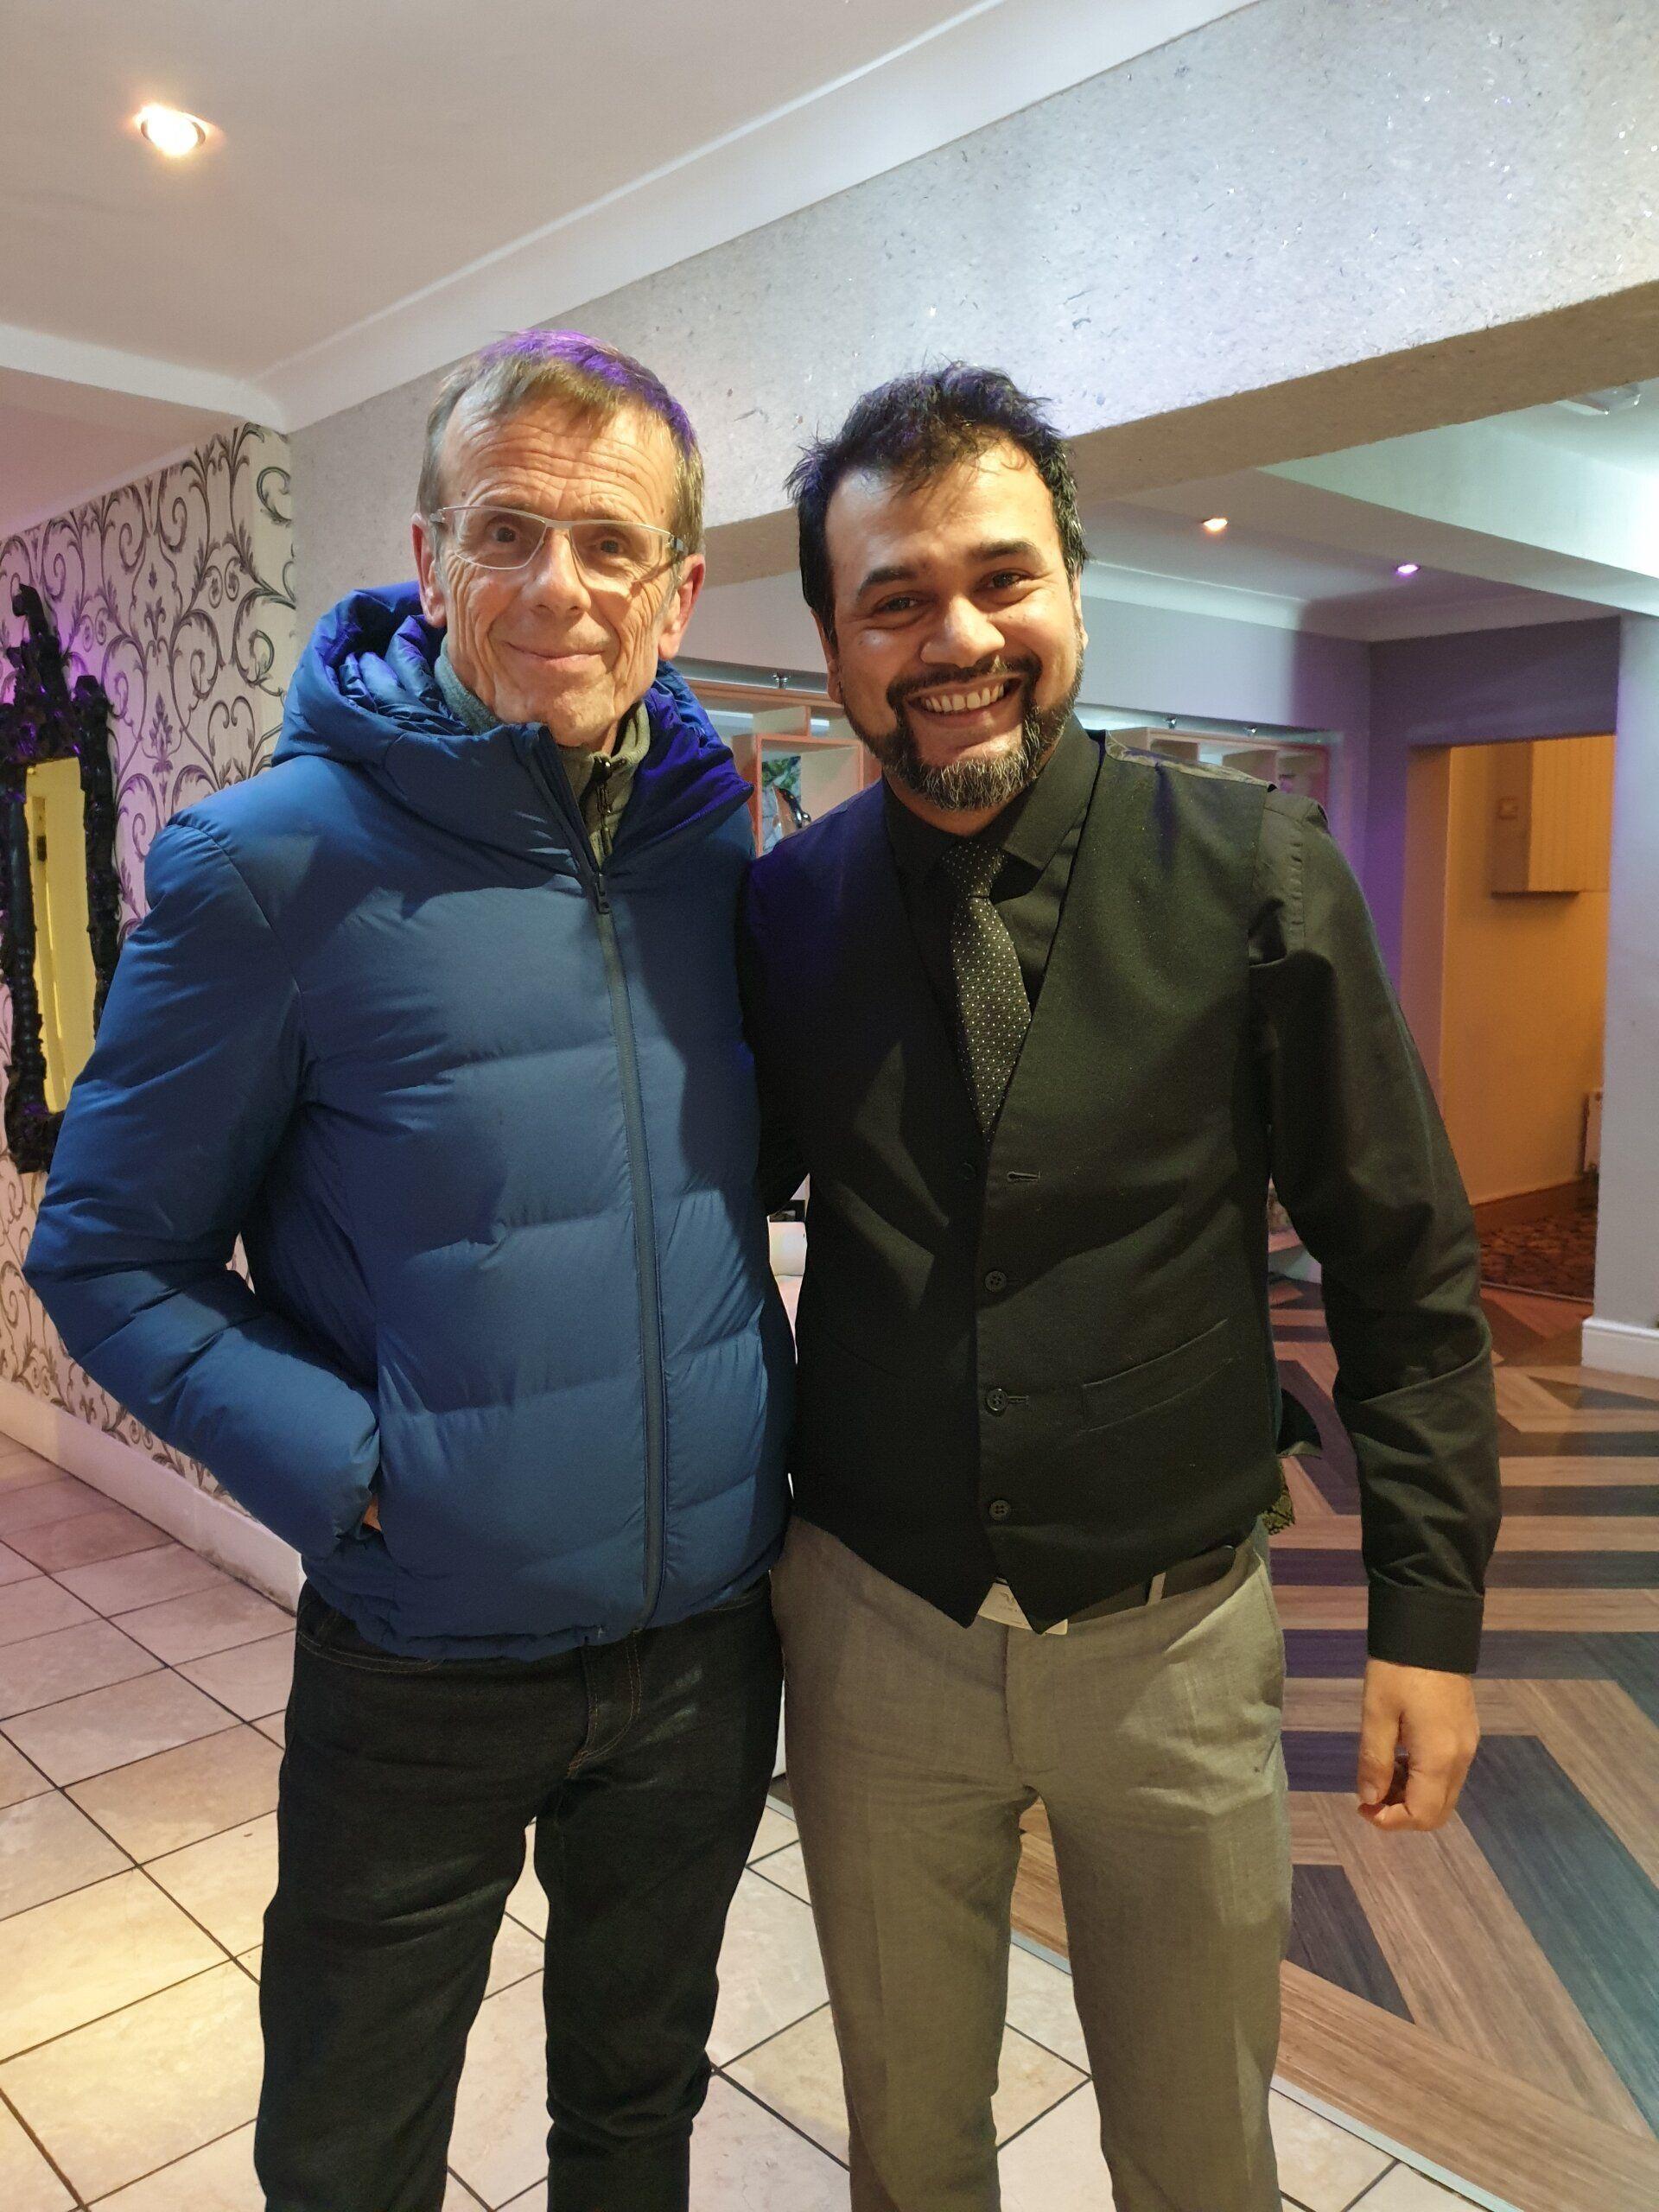 Firoz Ali next to actor Tom Watt